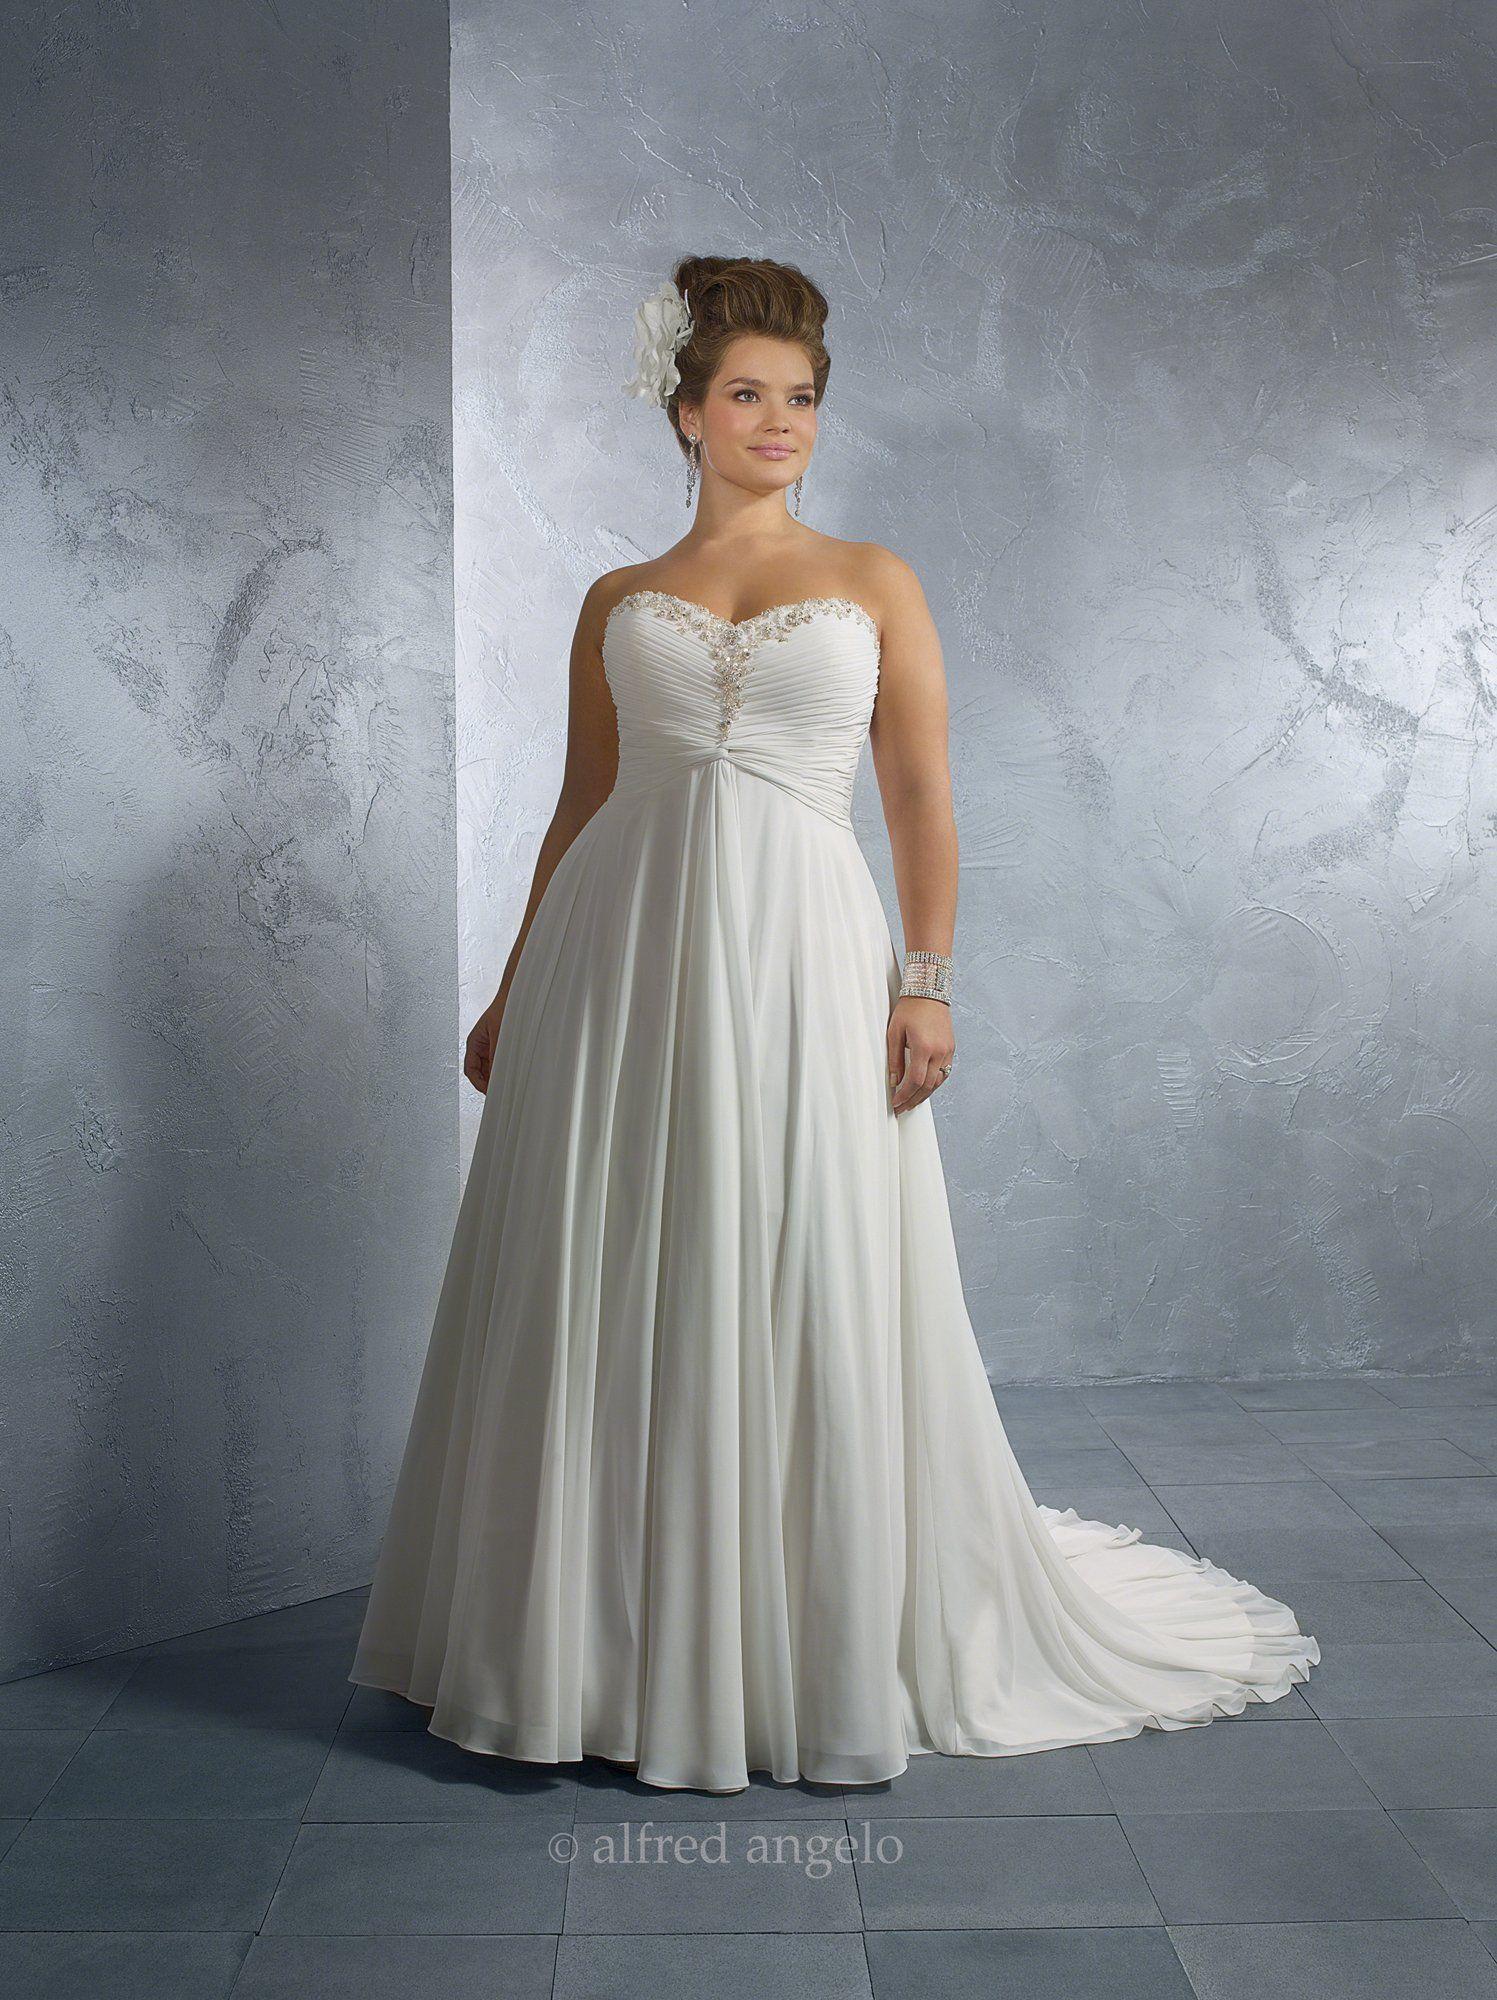 Old Fashioned Plus Size Wedding Dresses San Diego Photos - All ...